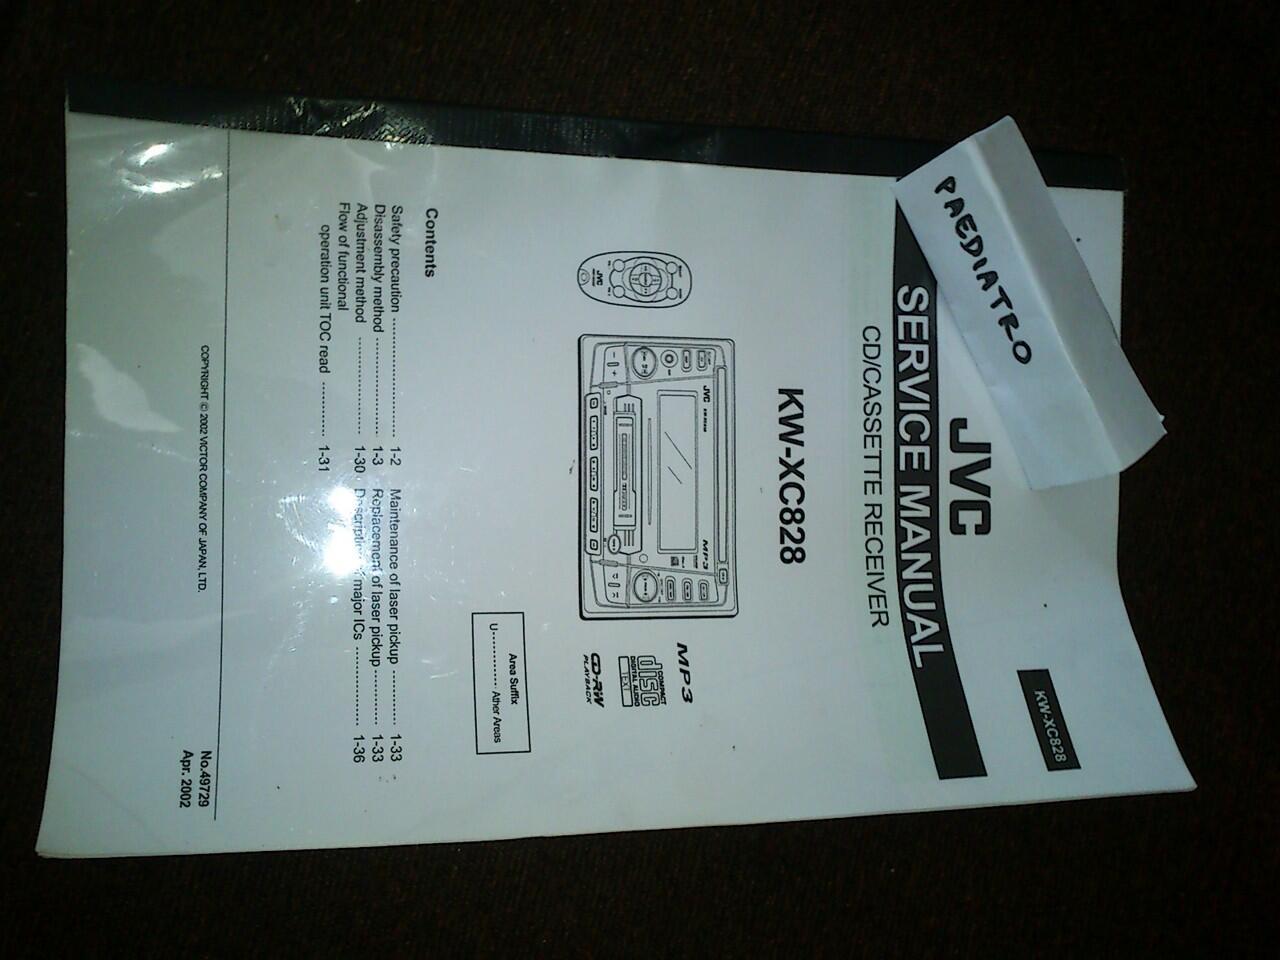 Double Din JVC KW-XC828 + cd changer 12 disc jvc